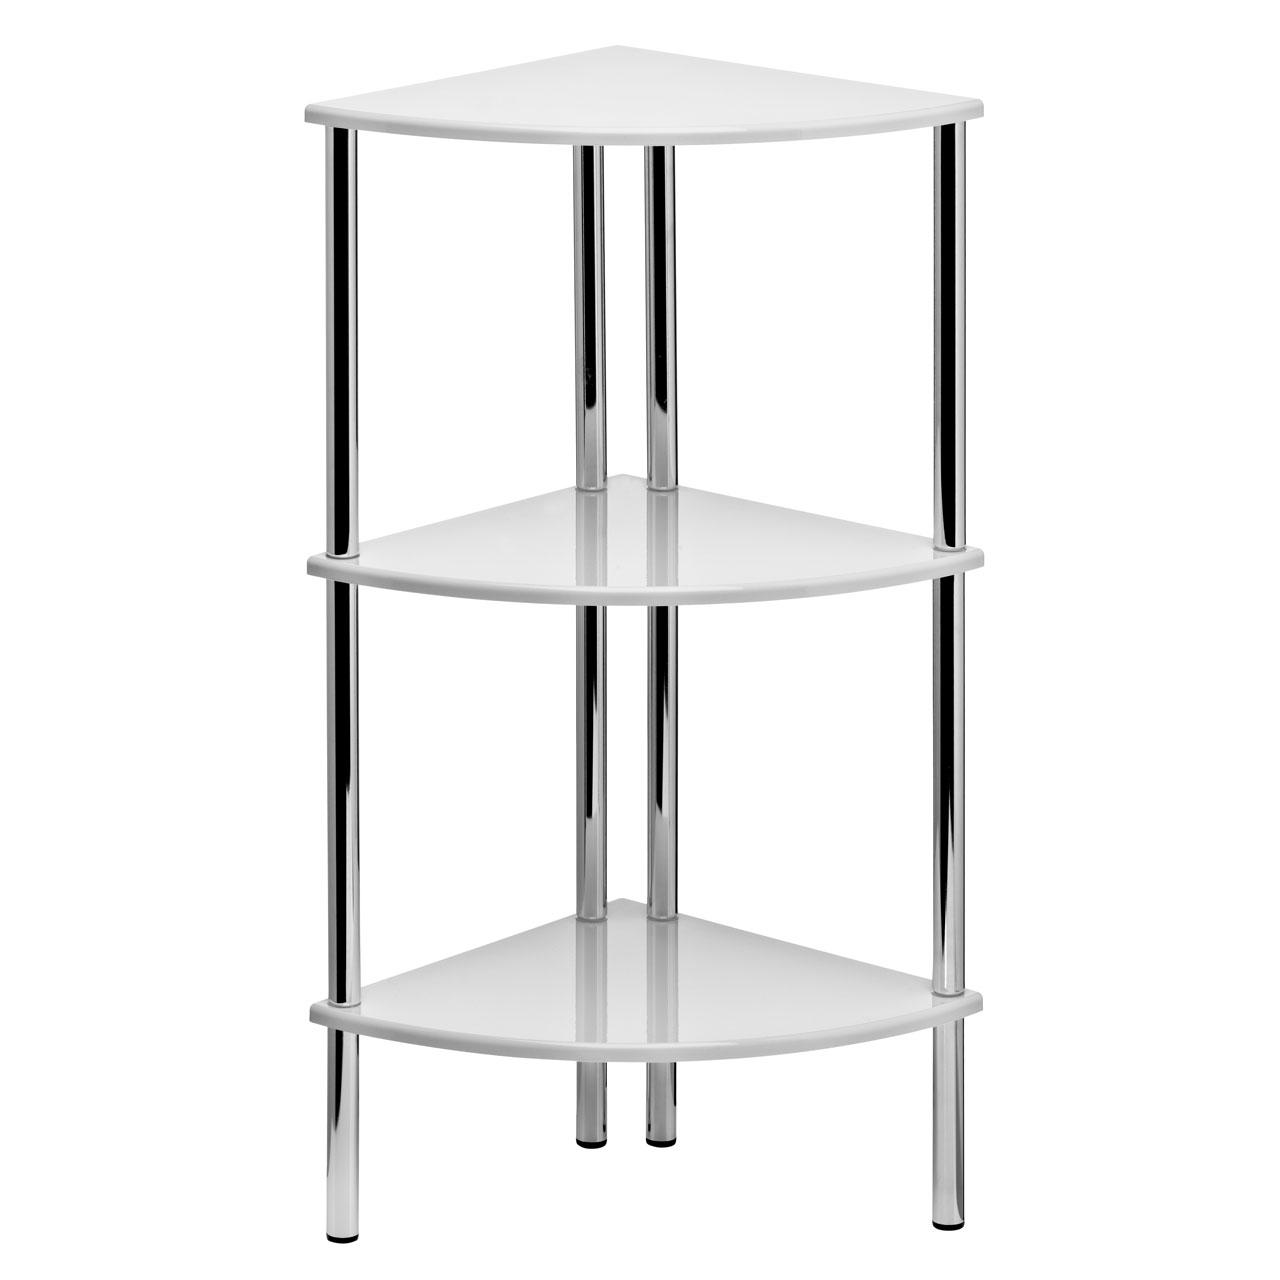 78cm High Gloss Corner Shelf Display Unit 3 Tier Shelves